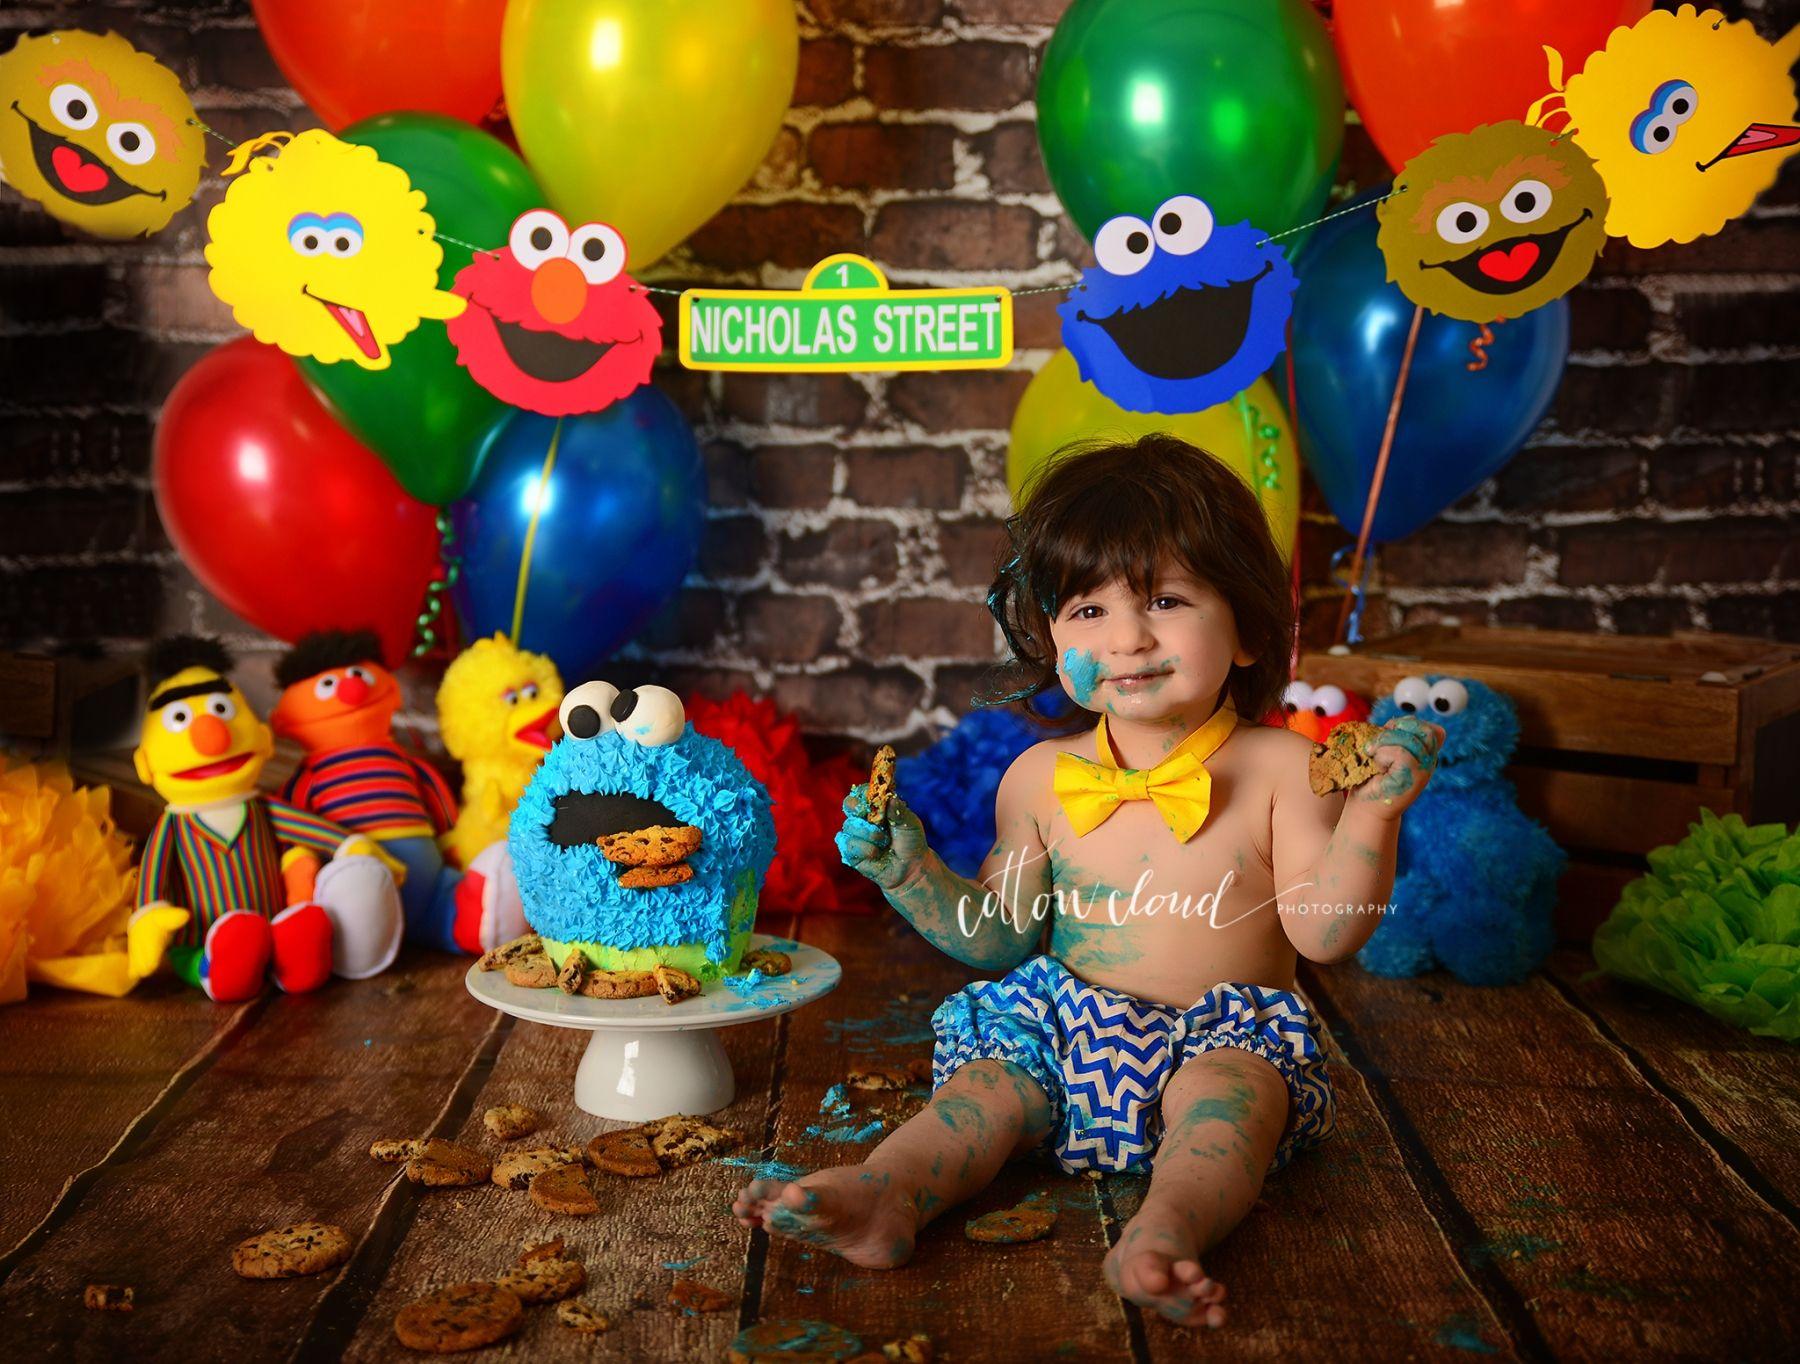 Birthday Cakes Macarthur ~ Cake smash photography sydney campbelltown macarthur sesame street